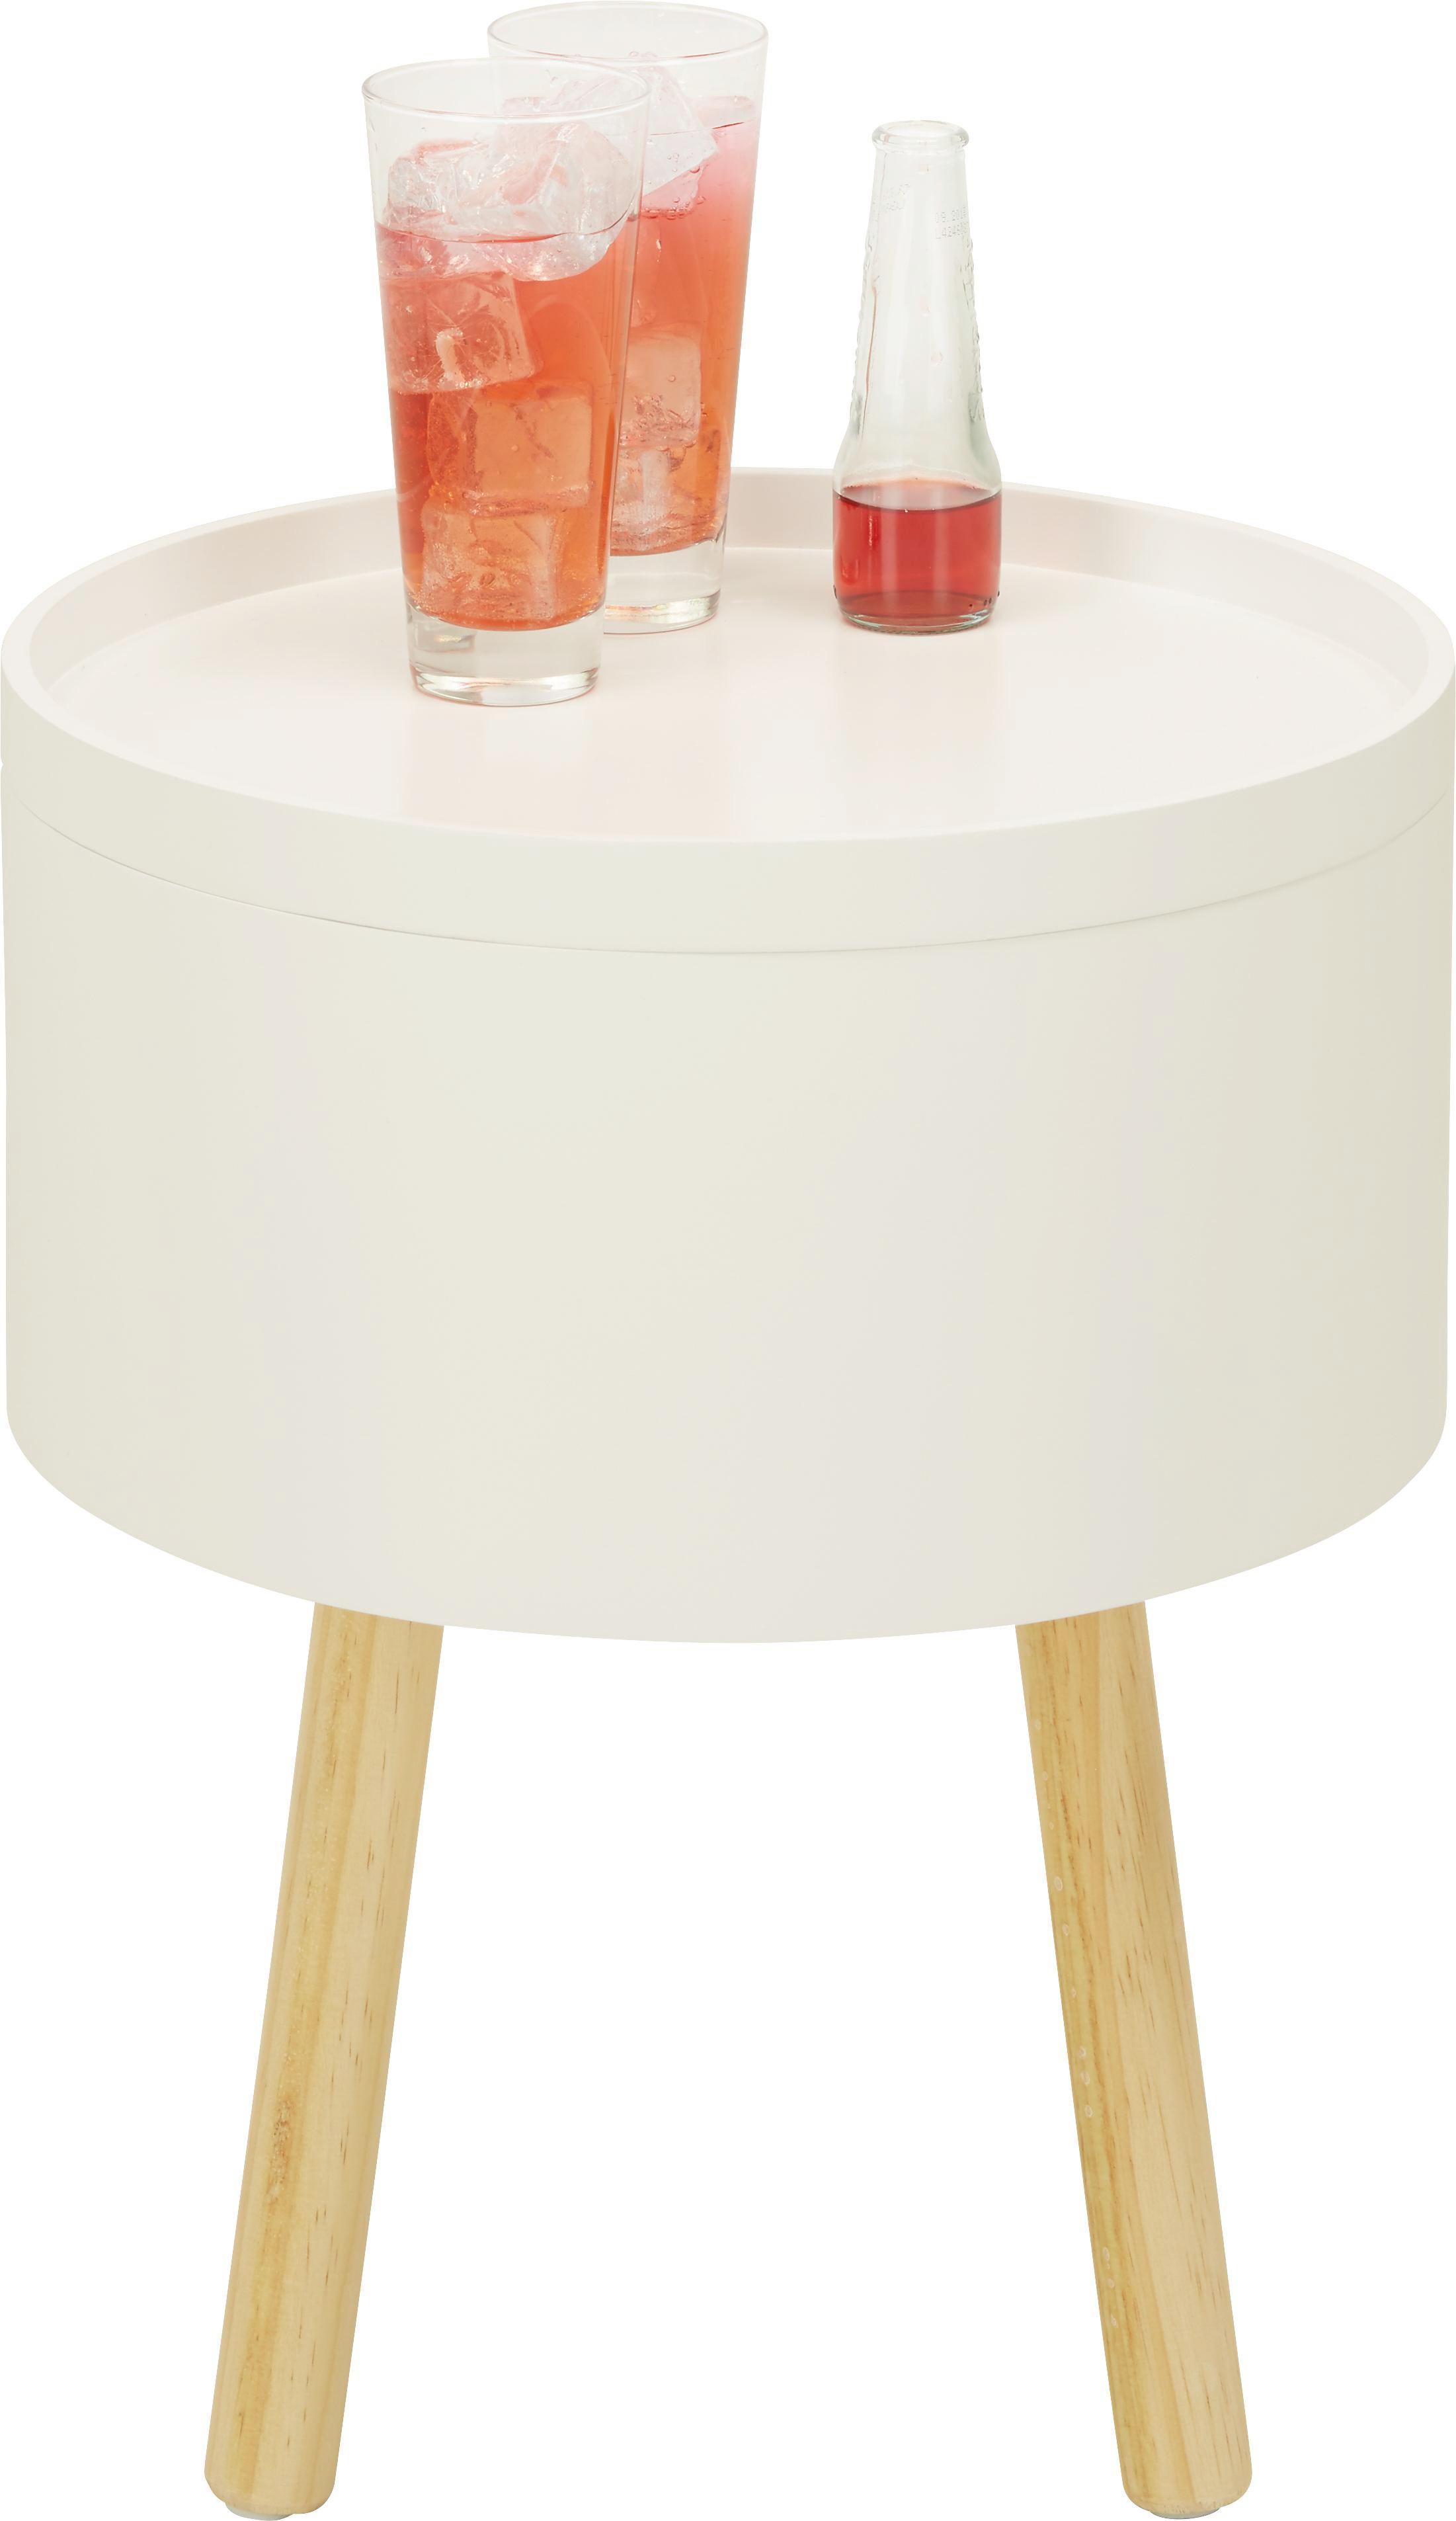 Dekosulen Modern. Elegant Image Vanities For Bedrooms With White ...